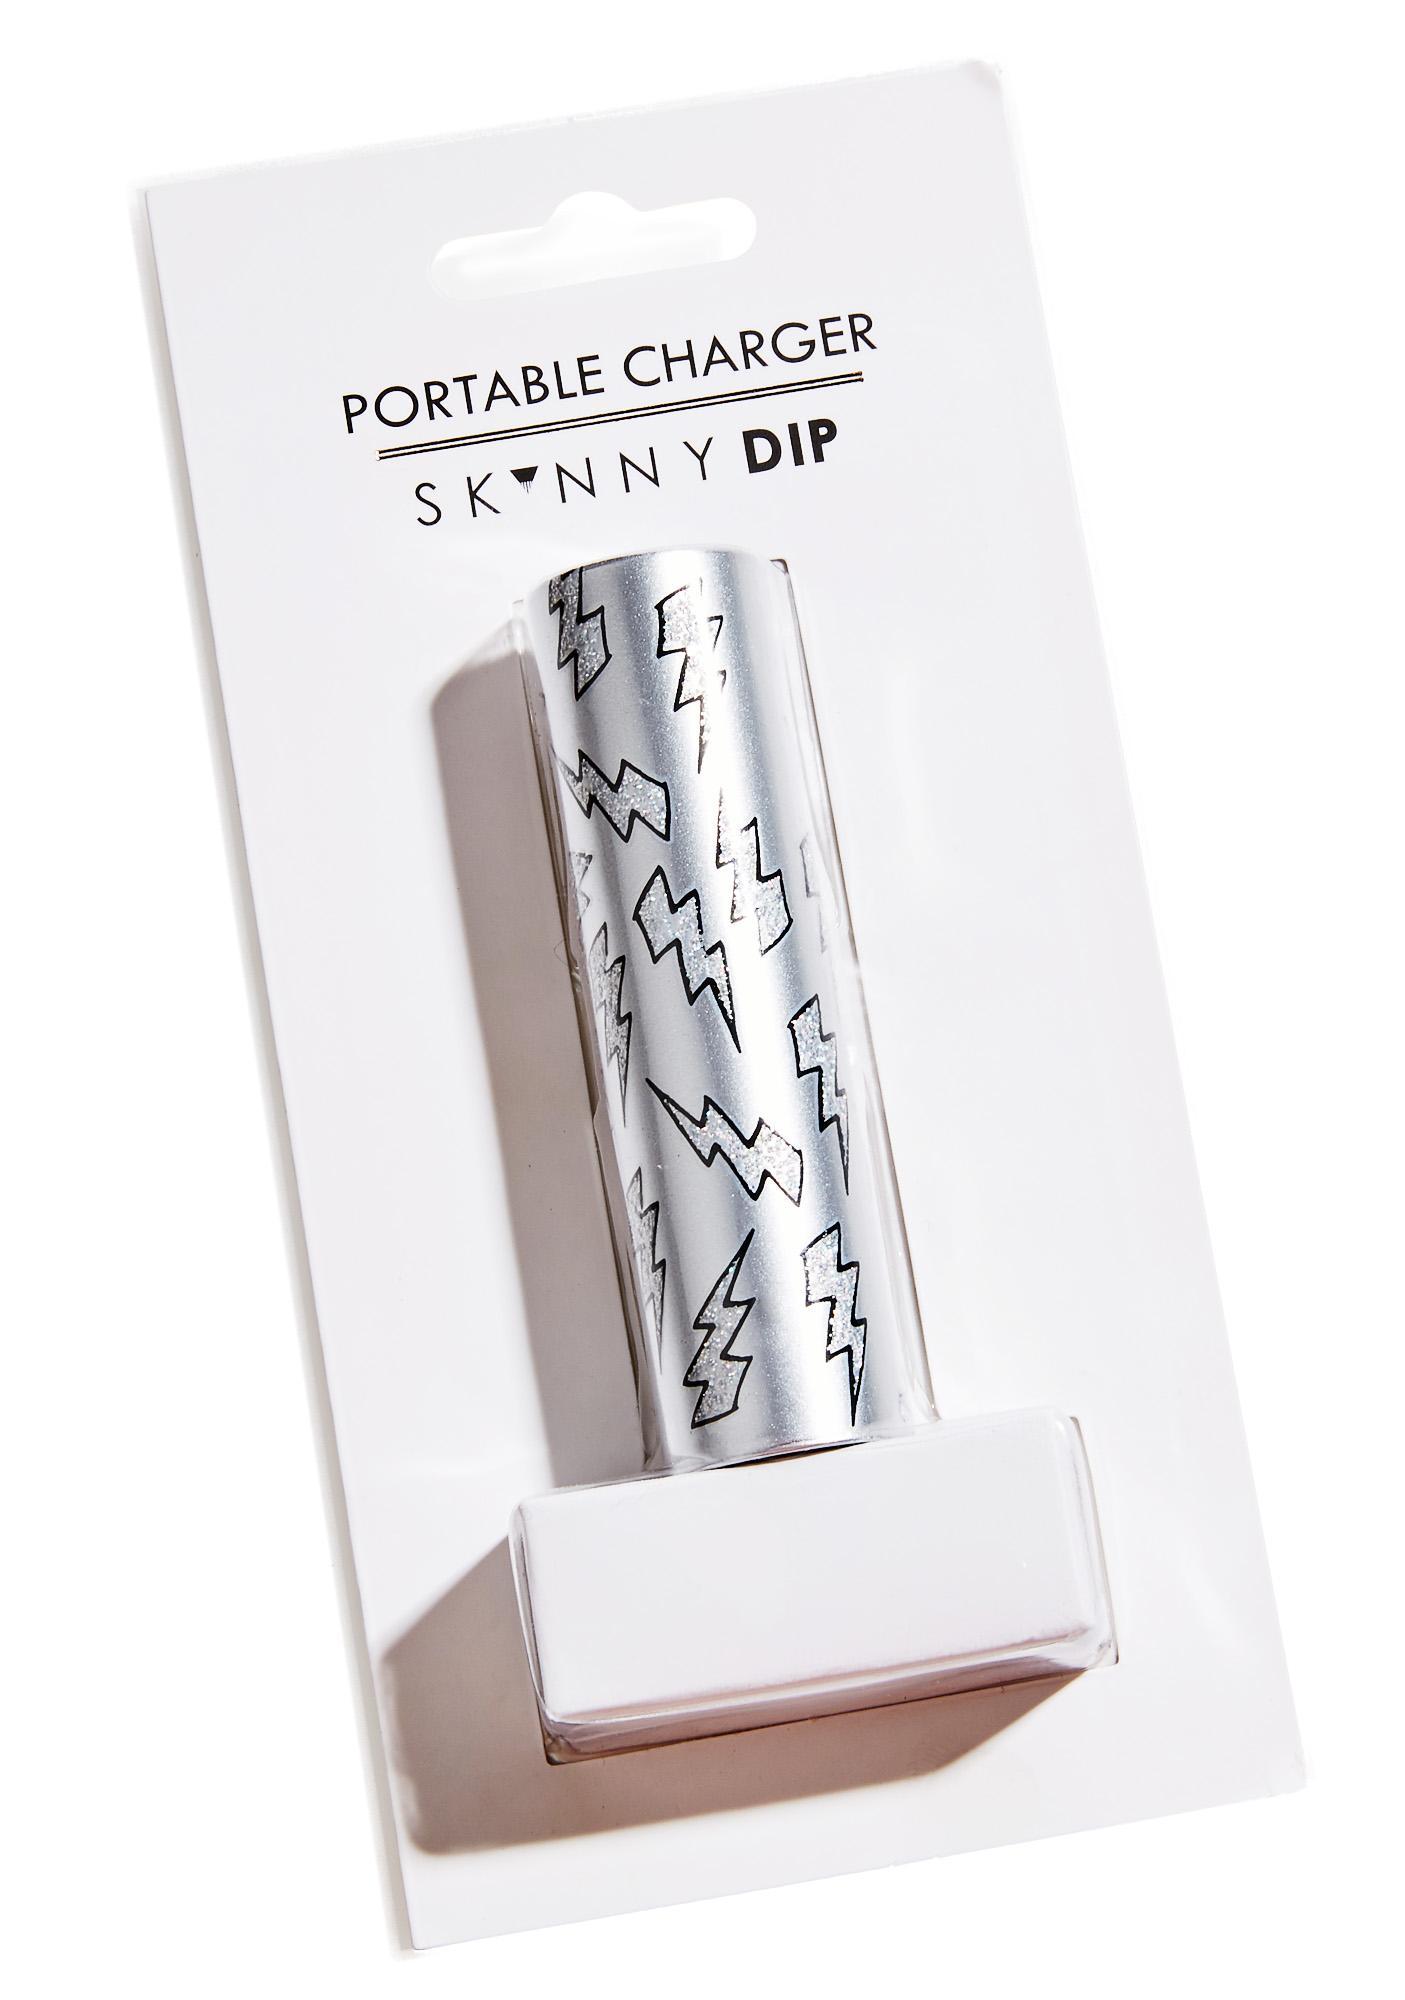 Skinnydip Lightning Bolt Portable Charger